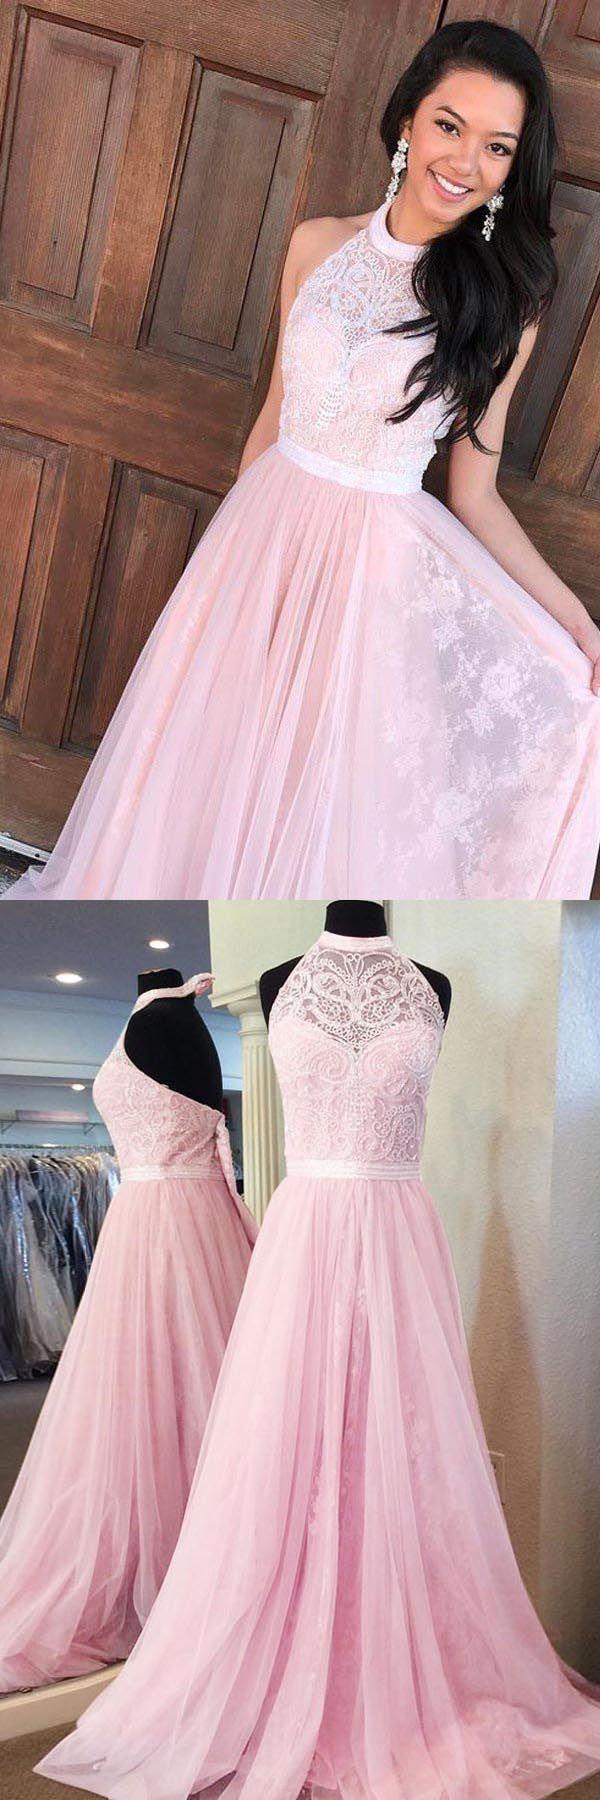 Long Prom Dresses, A Line Prom Dresses, Halter Prom Dresses, Lace Prom Dresses 2018, #2018promdresses, #lacepromdresses, Prom Dresses Long, Long Prom Dresses 2018, 2018 Prom Dresses, Pink Prom Dresses, #longpromdresses, Prom Dresses On Sale, Lace Prom Dresses